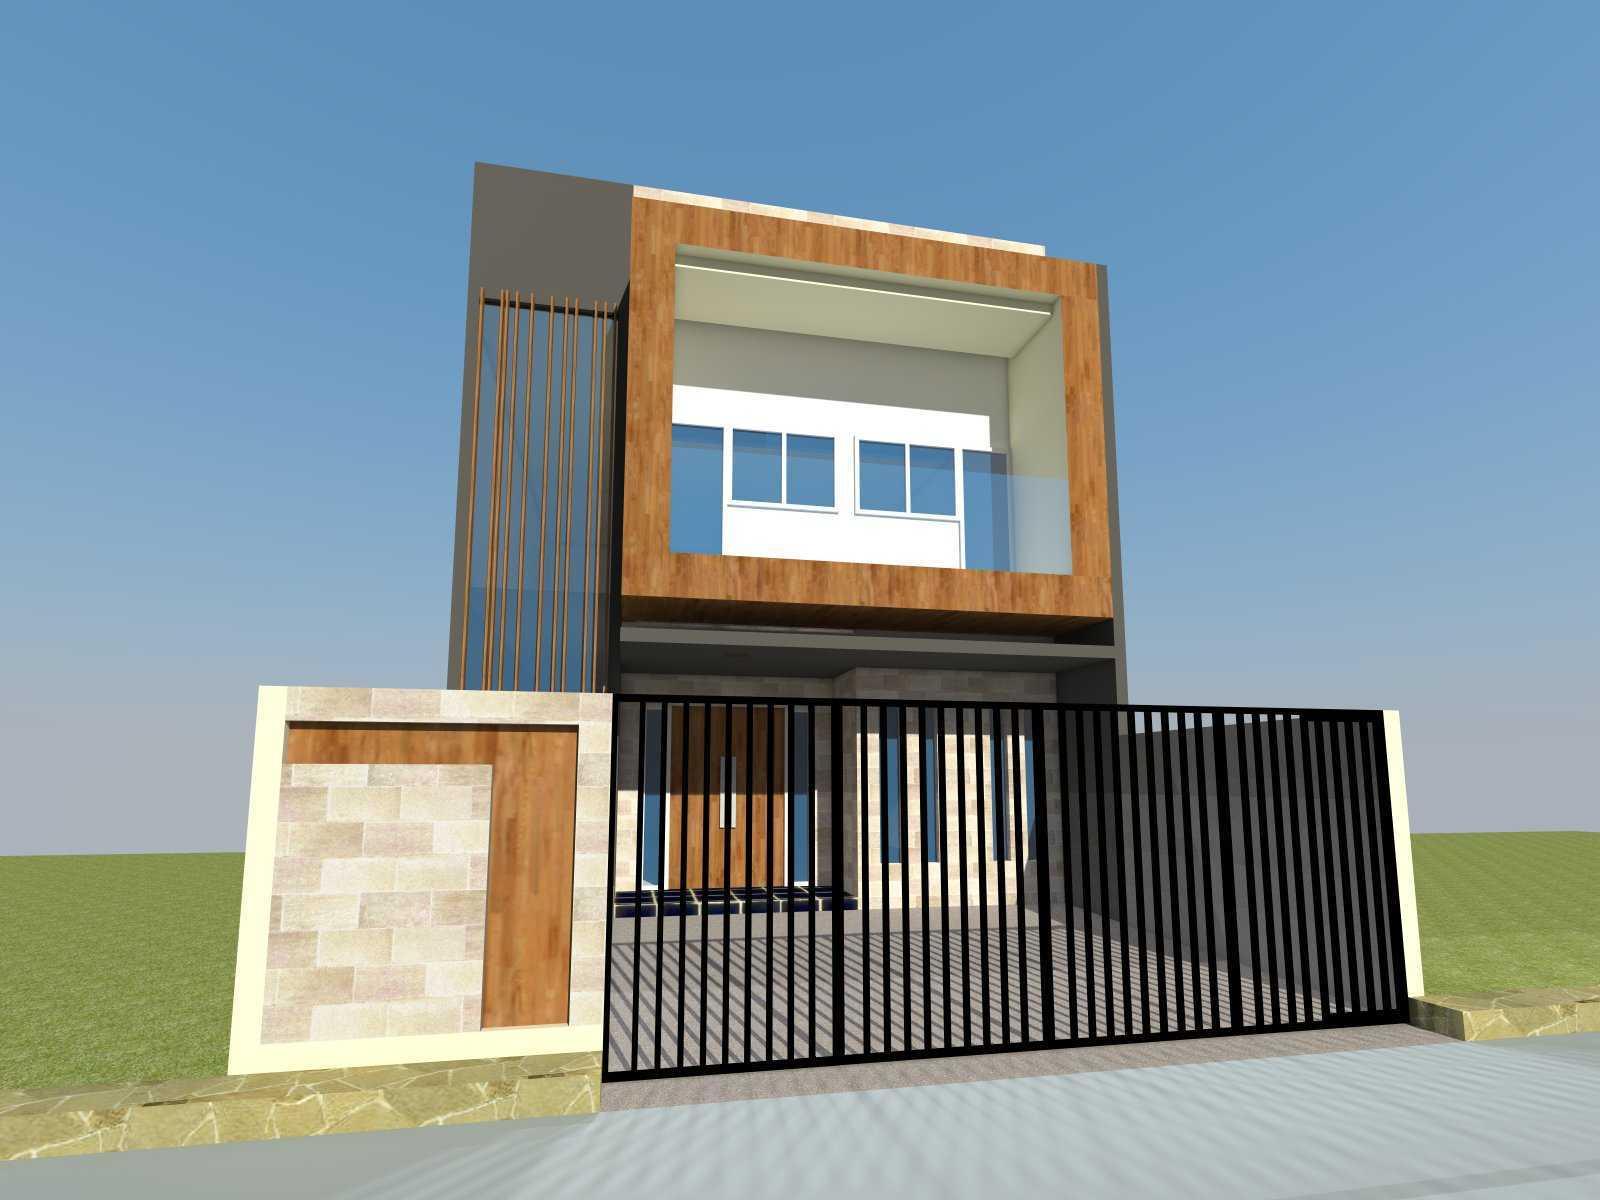 Equator.architect Minimalist House At Citra 2 Jakarta, Indonesia Jakarta, Indonesia Front View Minimalis  19629